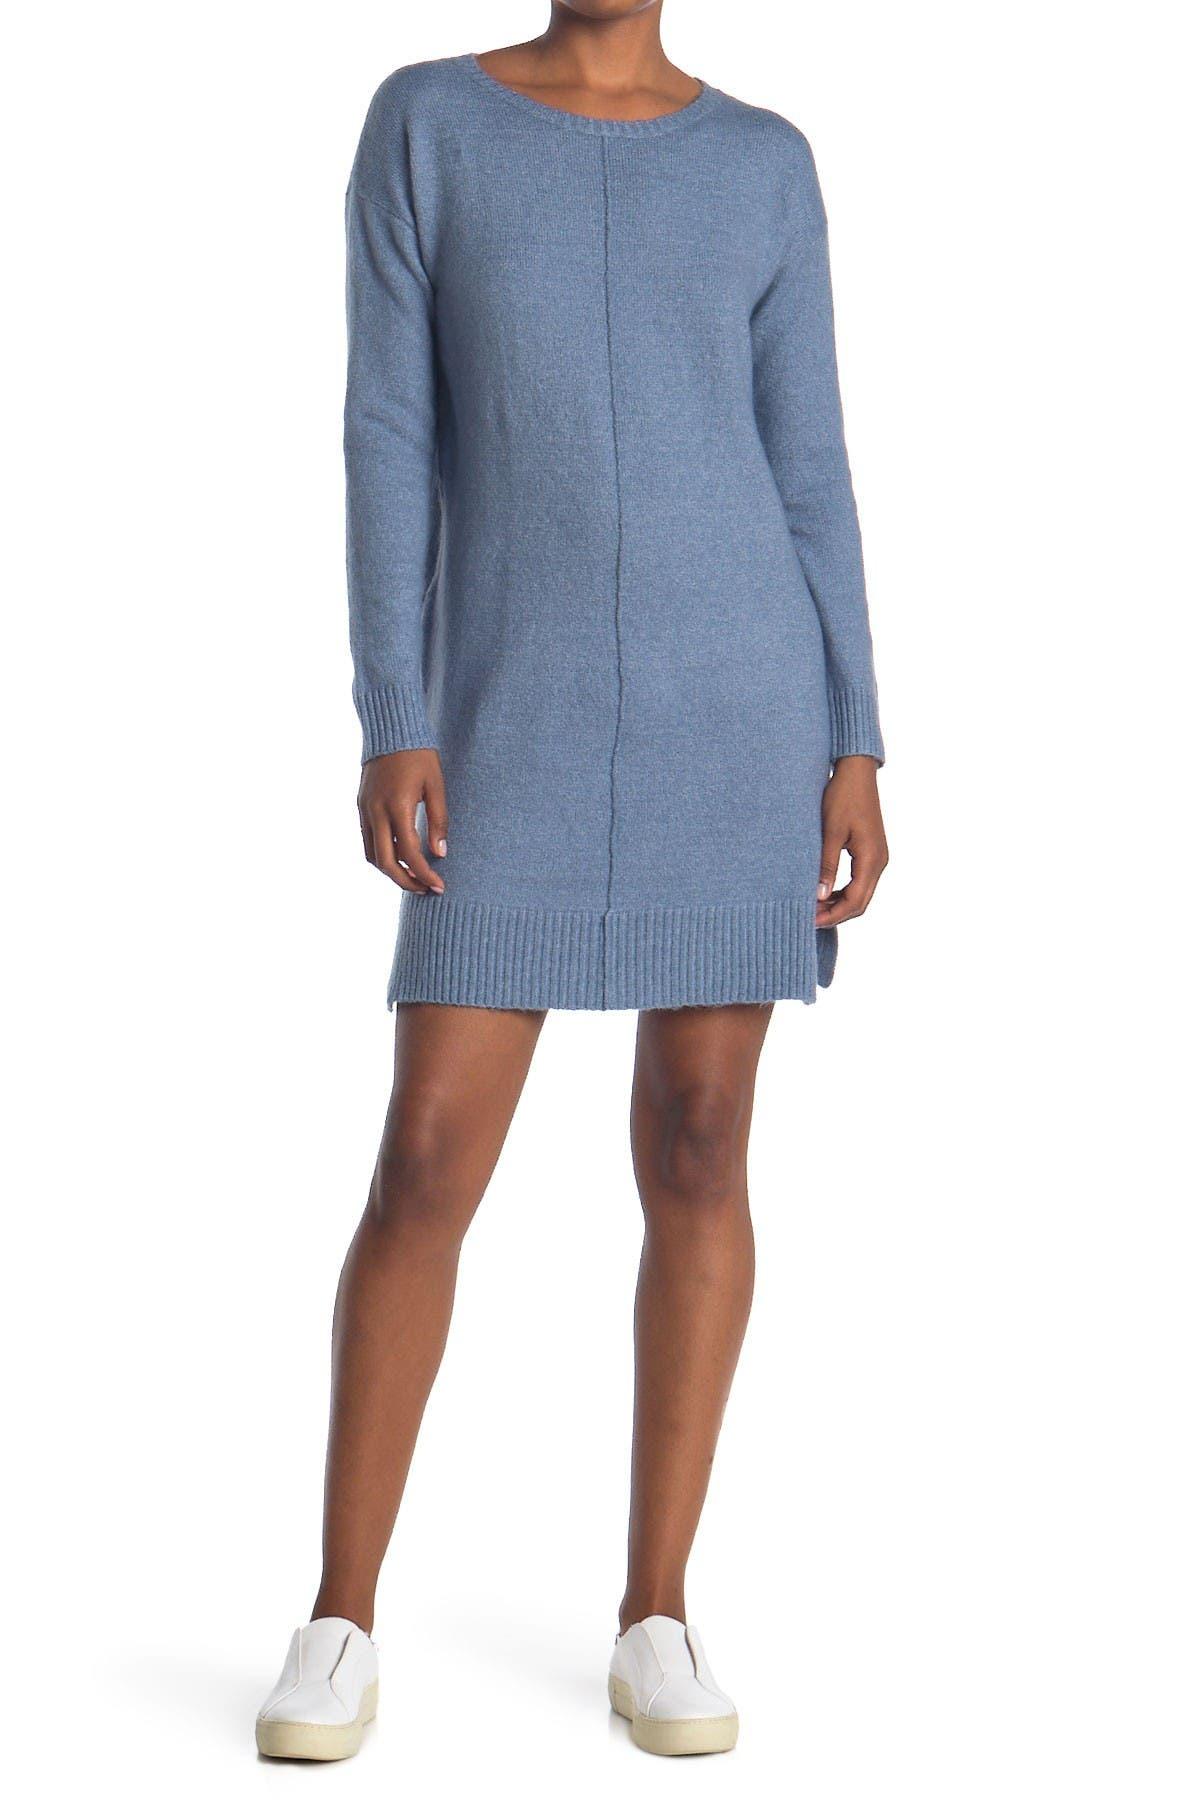 Image of STITCHDROP Center Seam Side Slit Sweater Dress